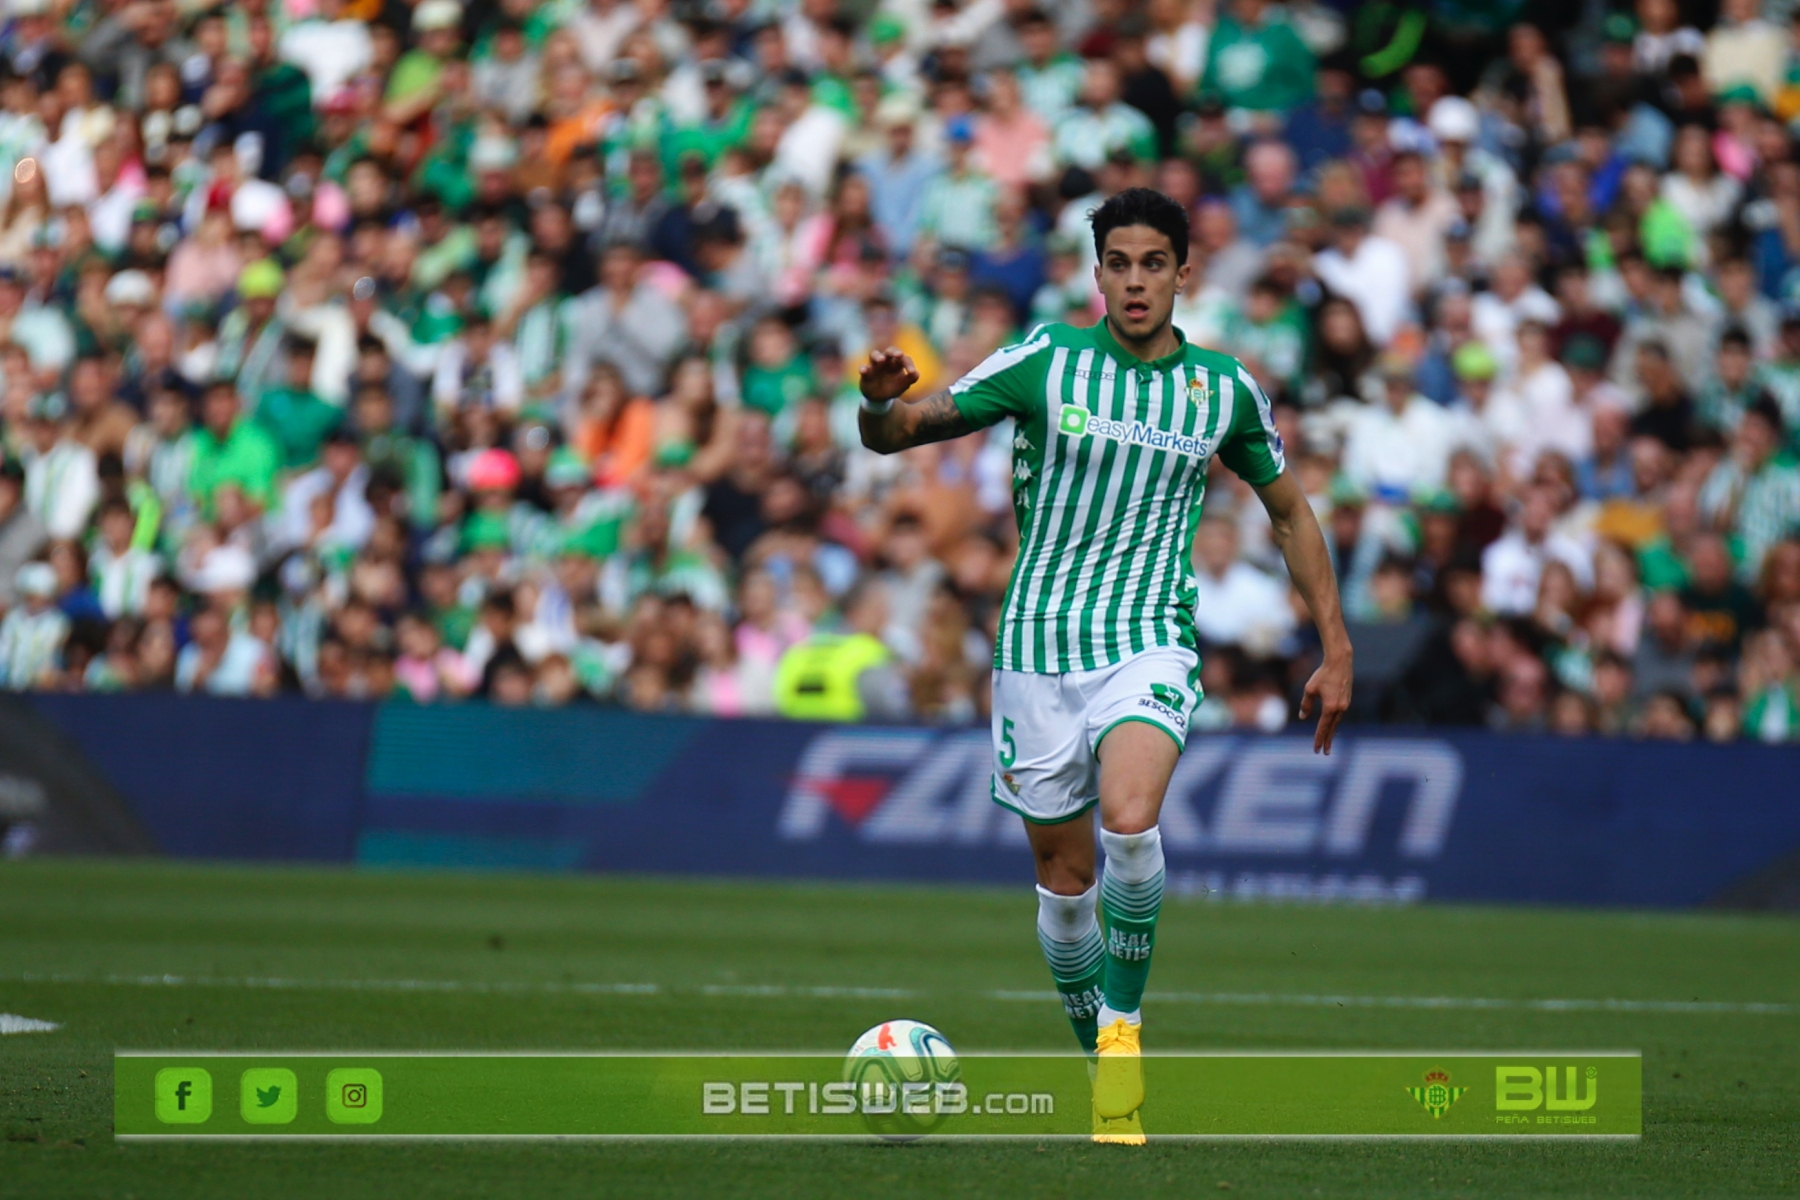 J20 Real Betis - Real Sociedad 22